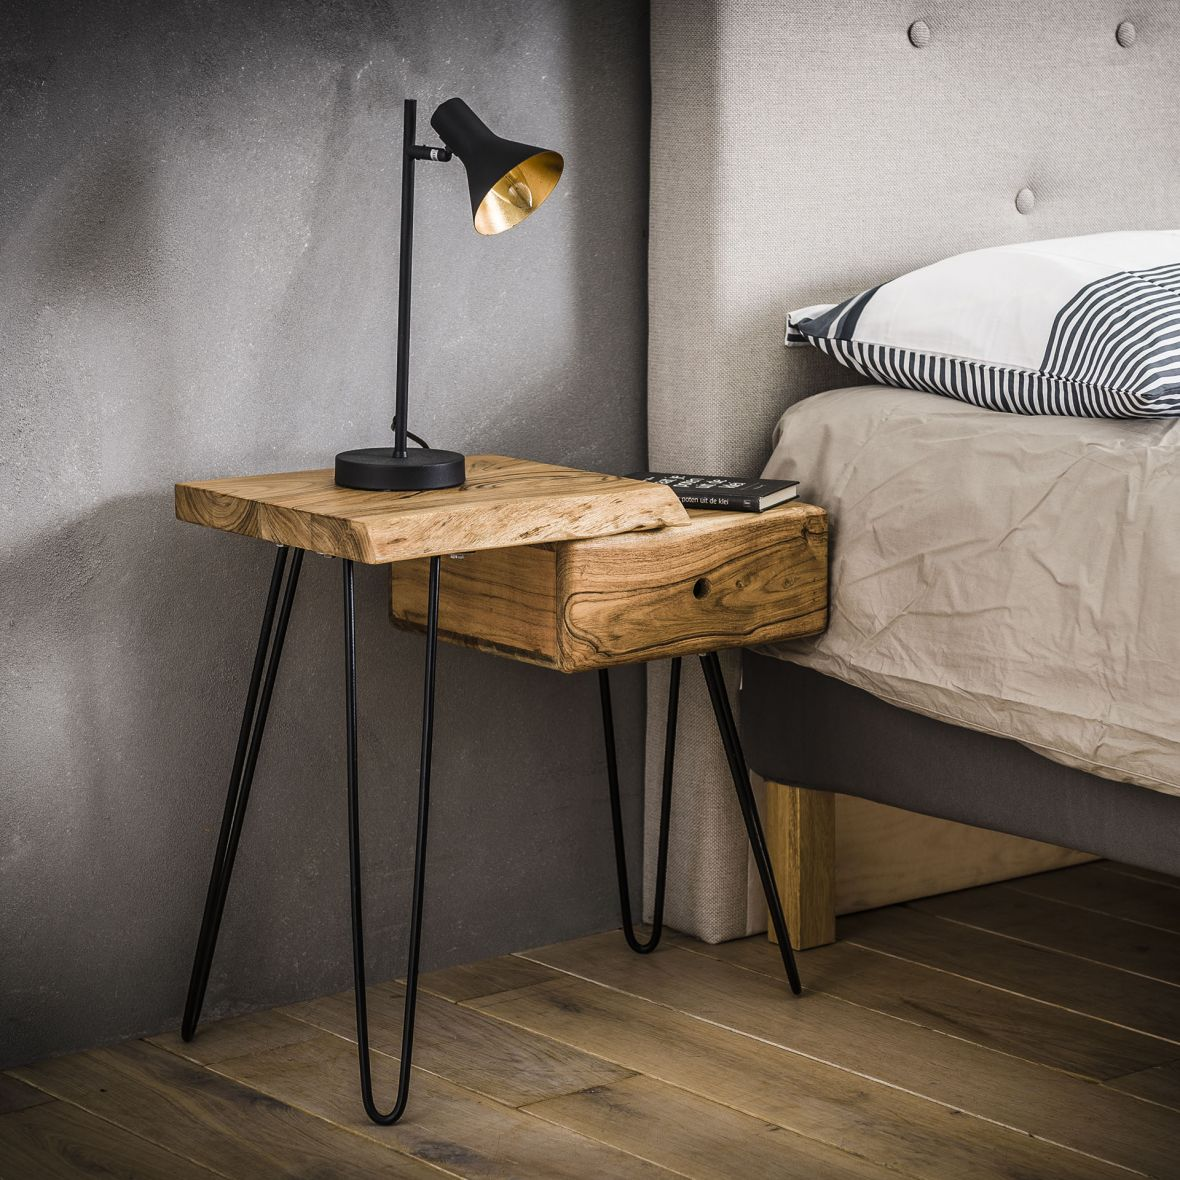 hairpin legs nachtkastje slaapkamer